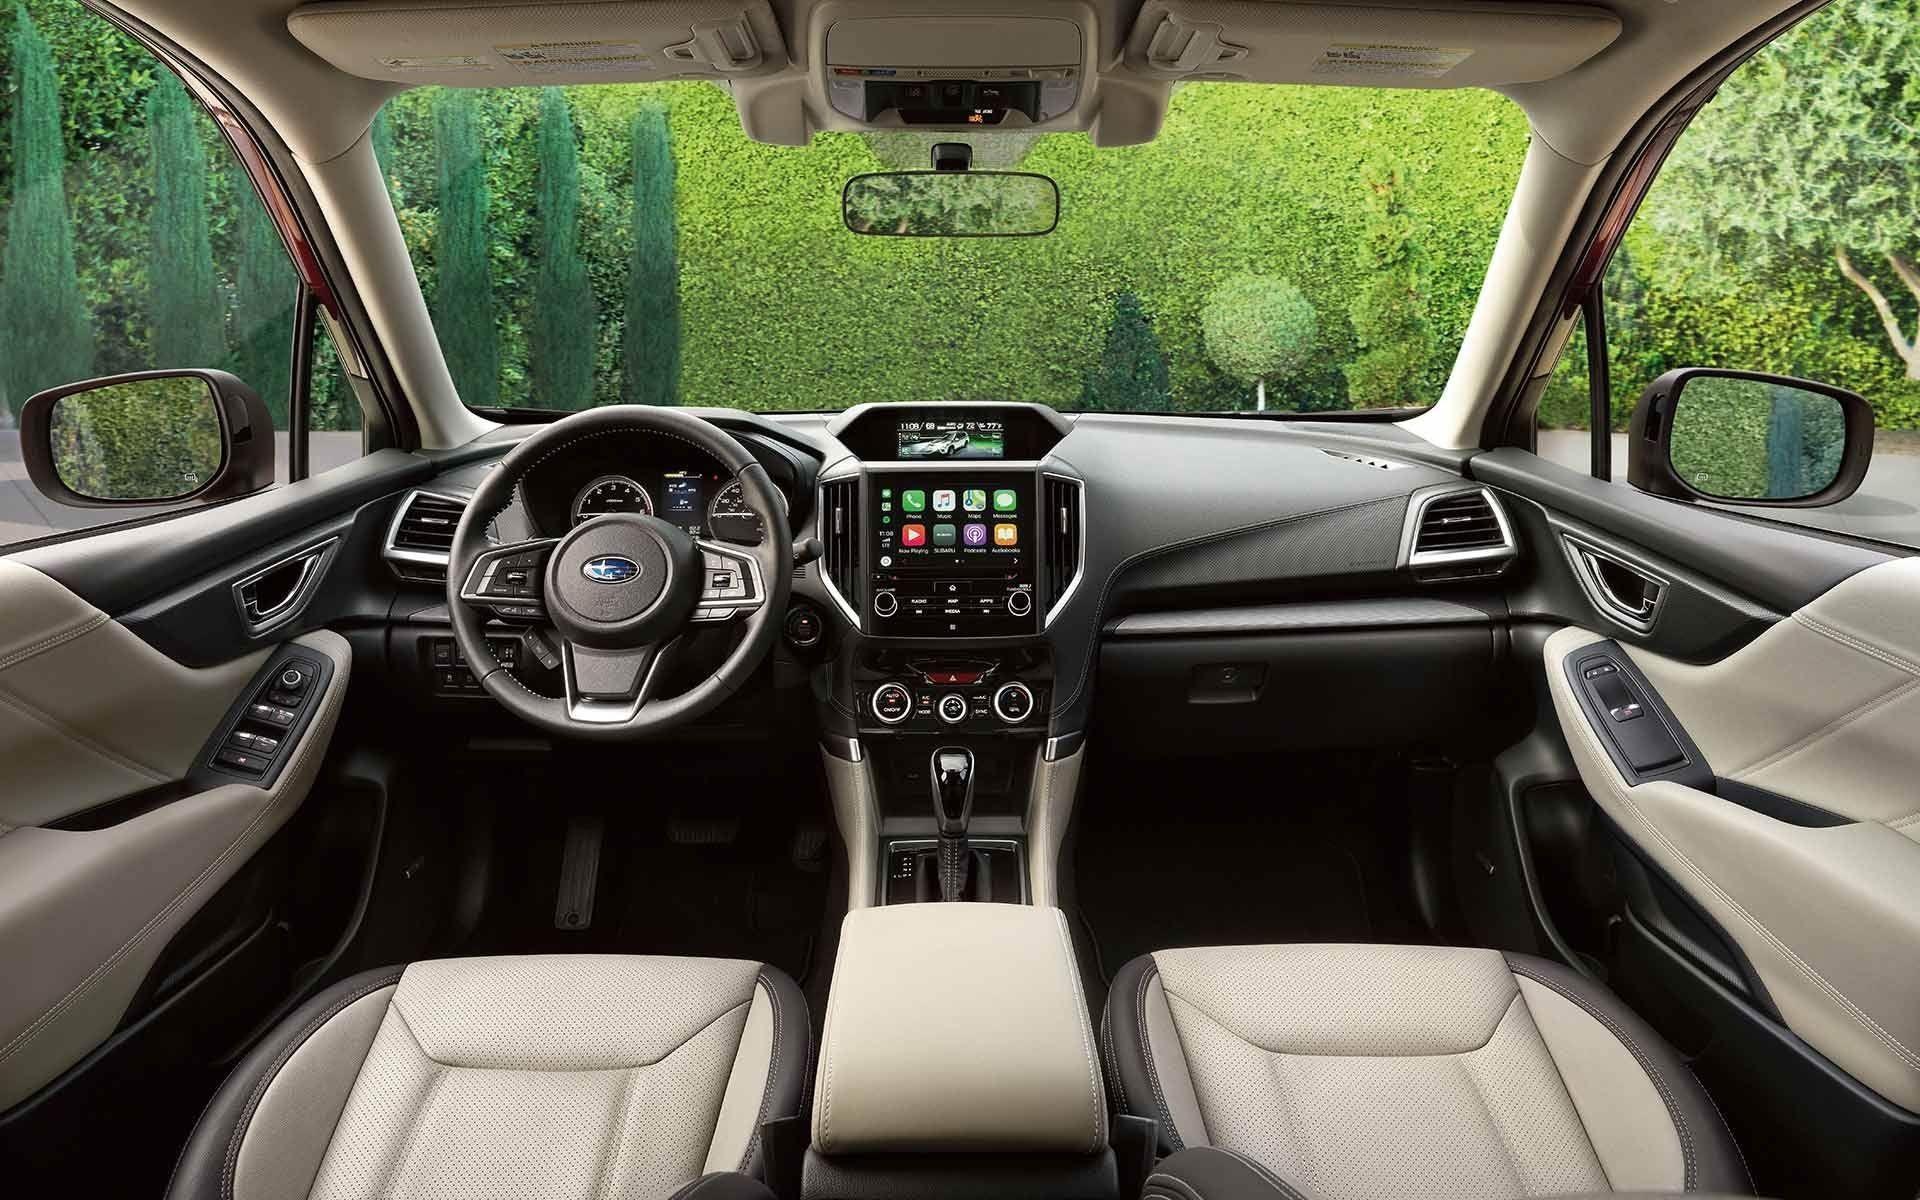 2020 Subaru Forester Interior In 2020 Subaru Forester Subaru Subaru Crosstrek